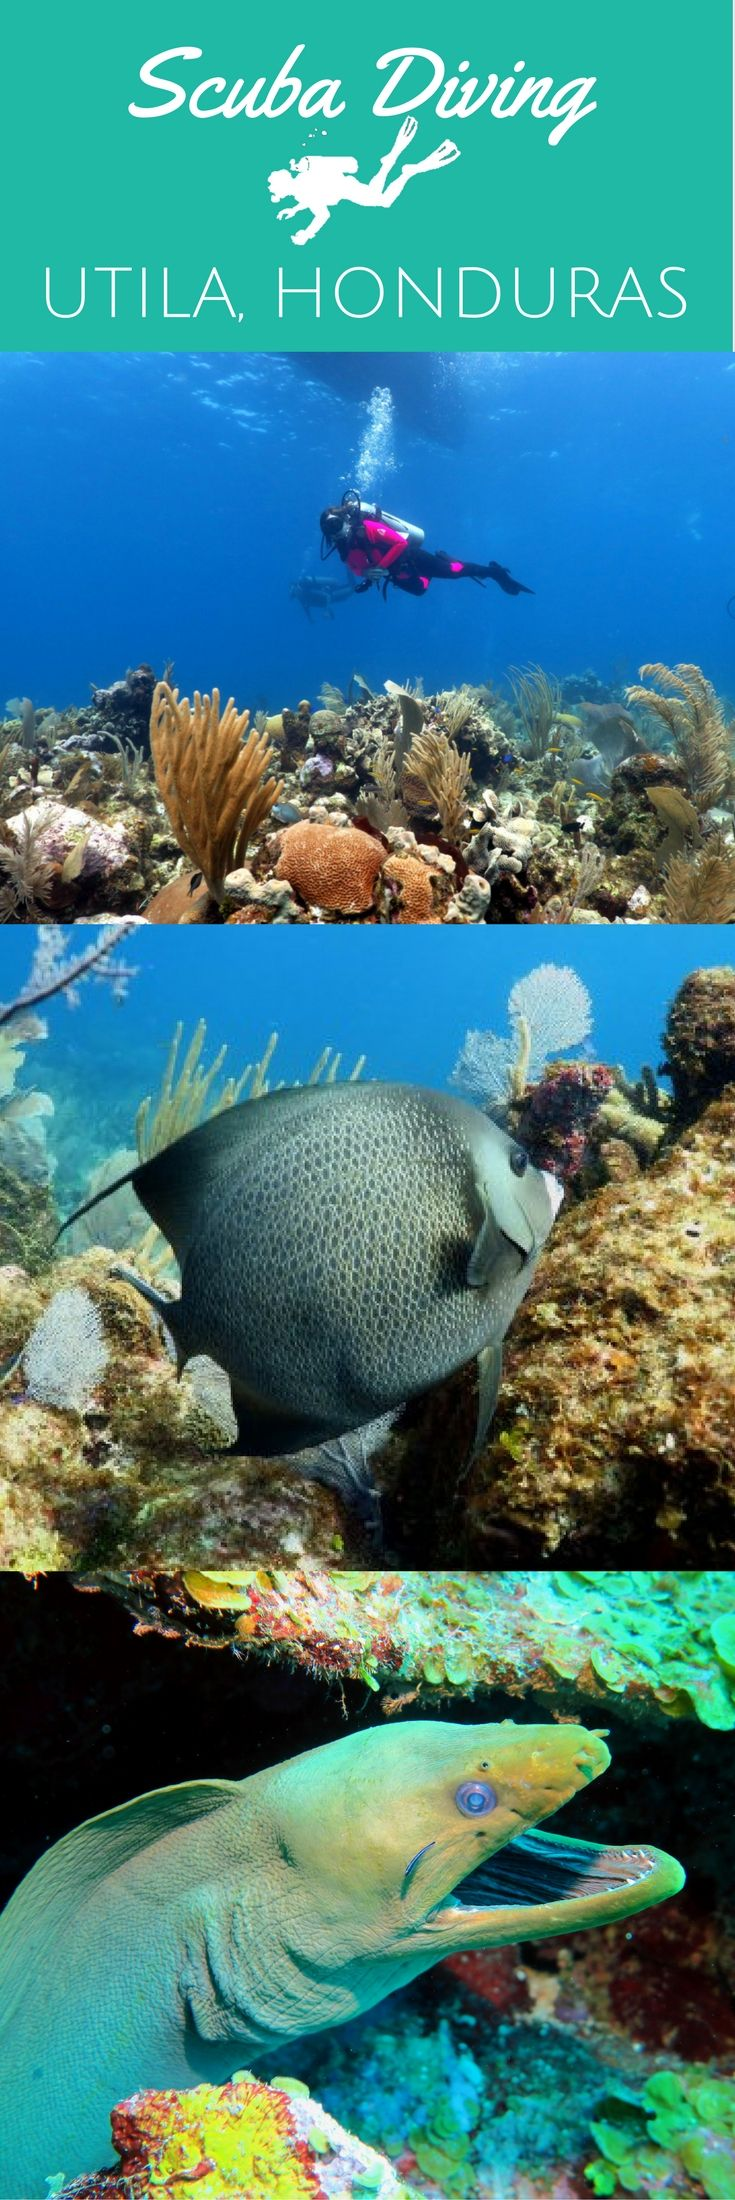 10 reasons to put Utila on your scuba diving bucket list - World Adventure Divers - Scuba diving, Utila, Honduras - read more on https://worldadventuredivers.com/2017/04/07/10-reasons-to-put-utila-on-your-scuba-diving-bucket-list/ http://www.deepbluediving.org/scuba-dive-computer/